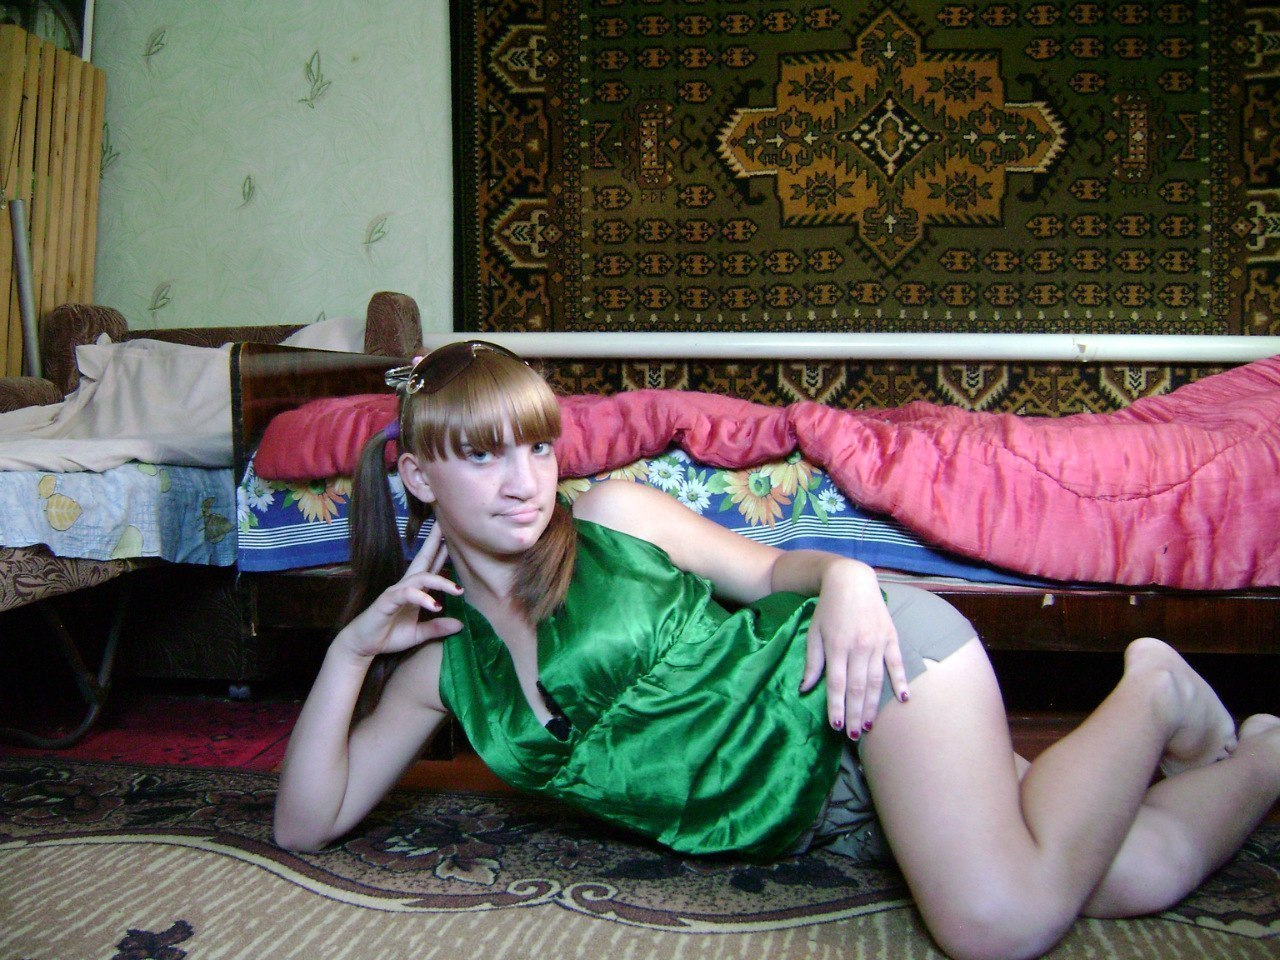 Фото девушки на сайте знакомств 16 фотография